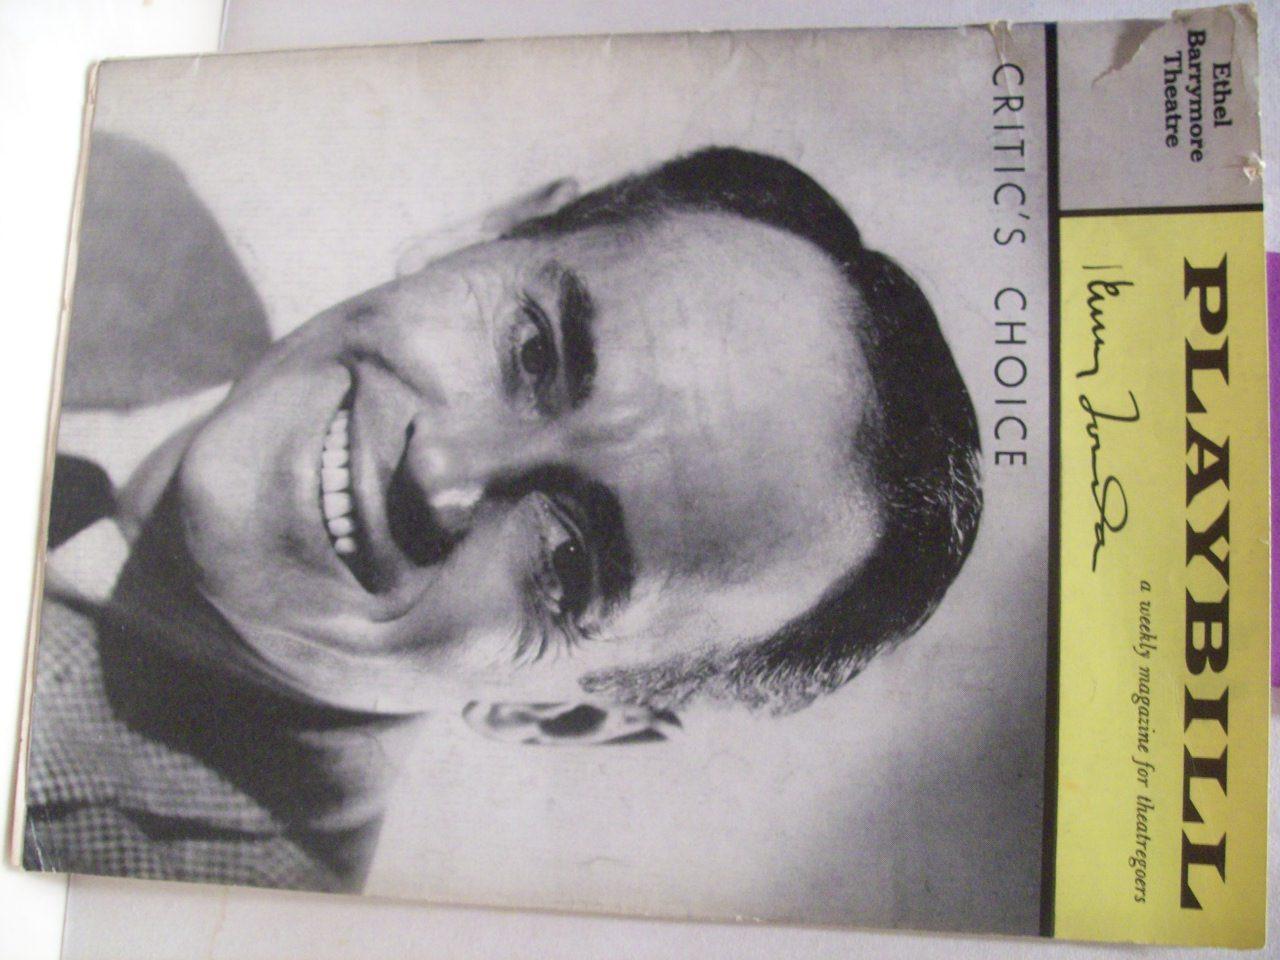 Fonda, Henry Playbill Signed Autograph Critic'S Choice 1961